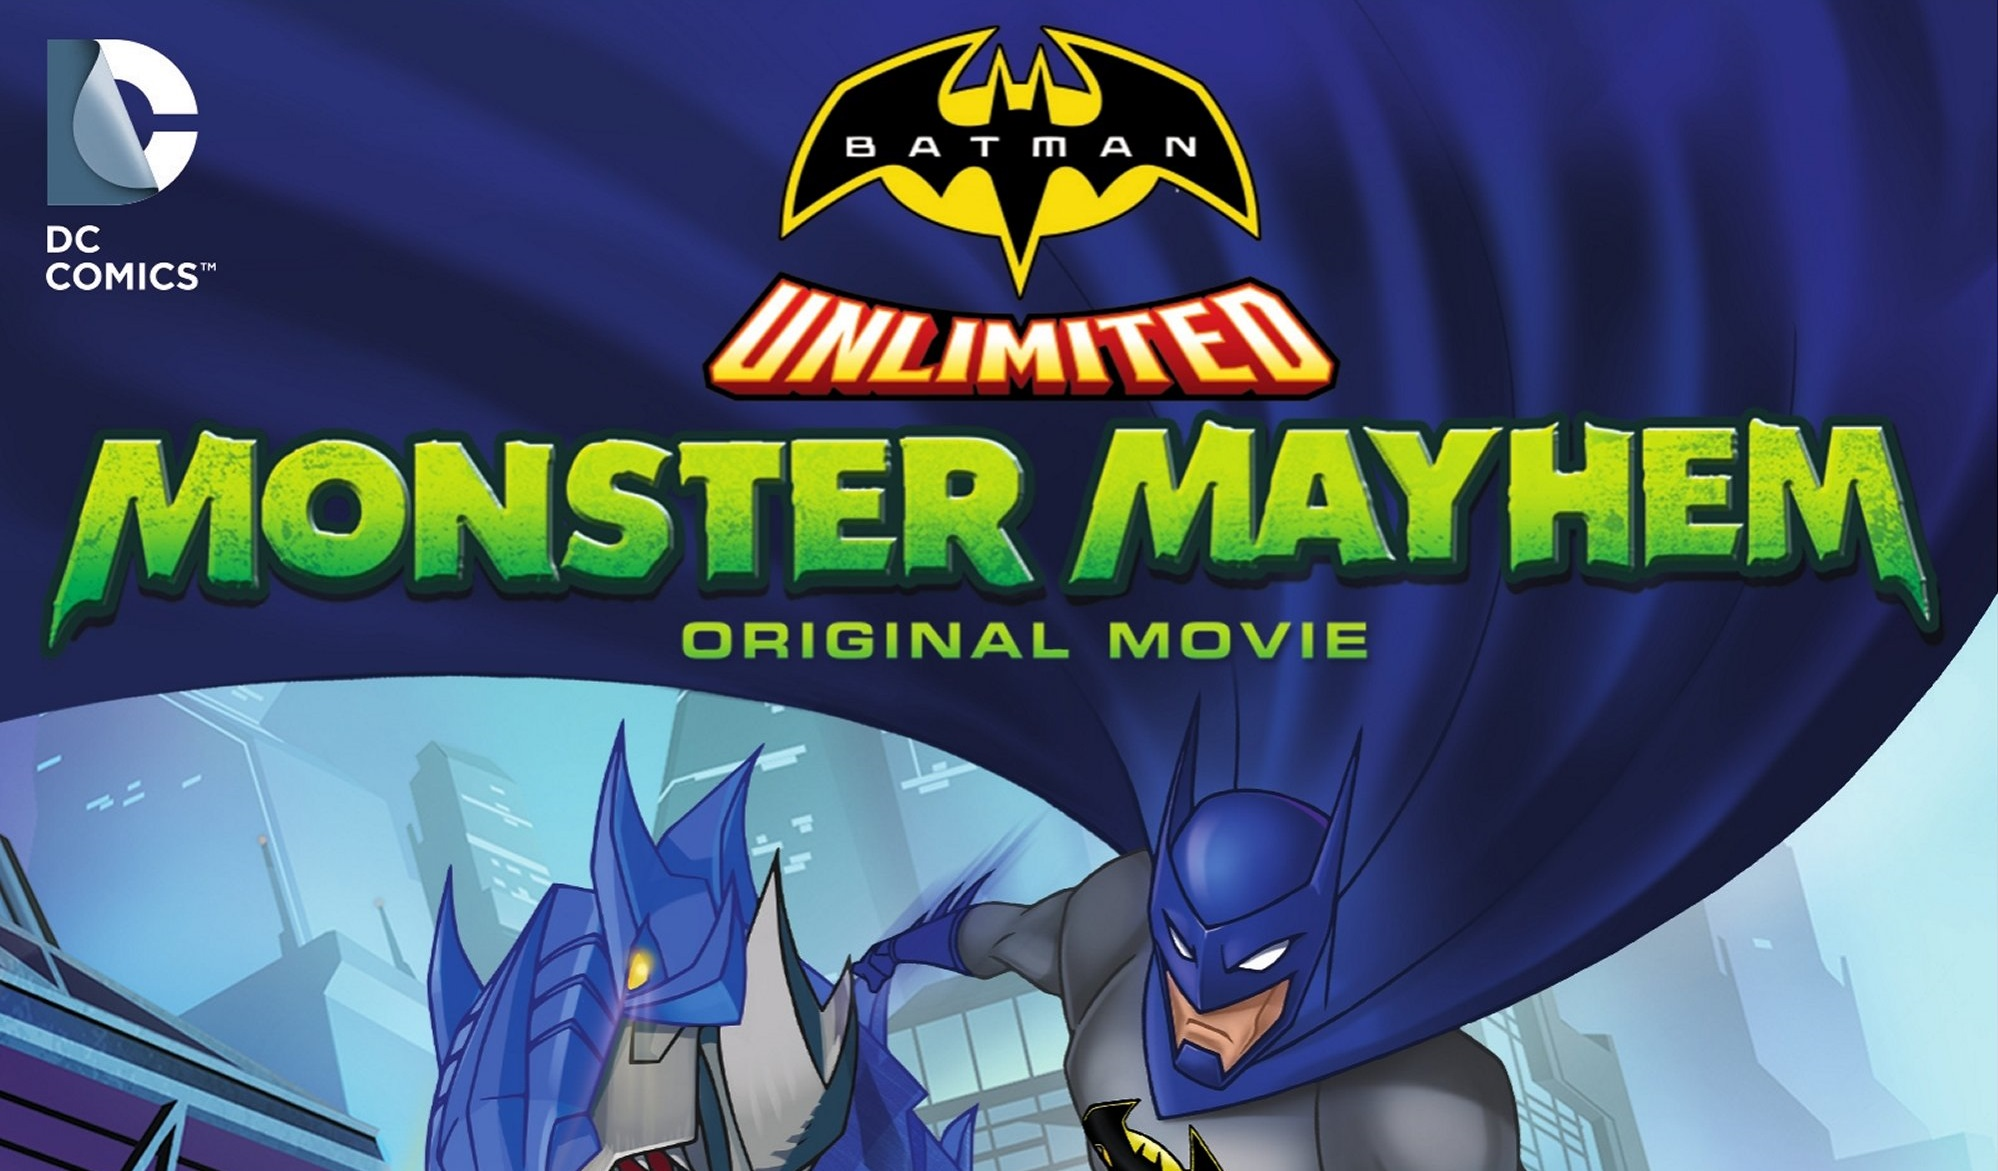 High Resolution Wallpaper | Batman Unlimited: Monster Mayhem 1998x1171 px